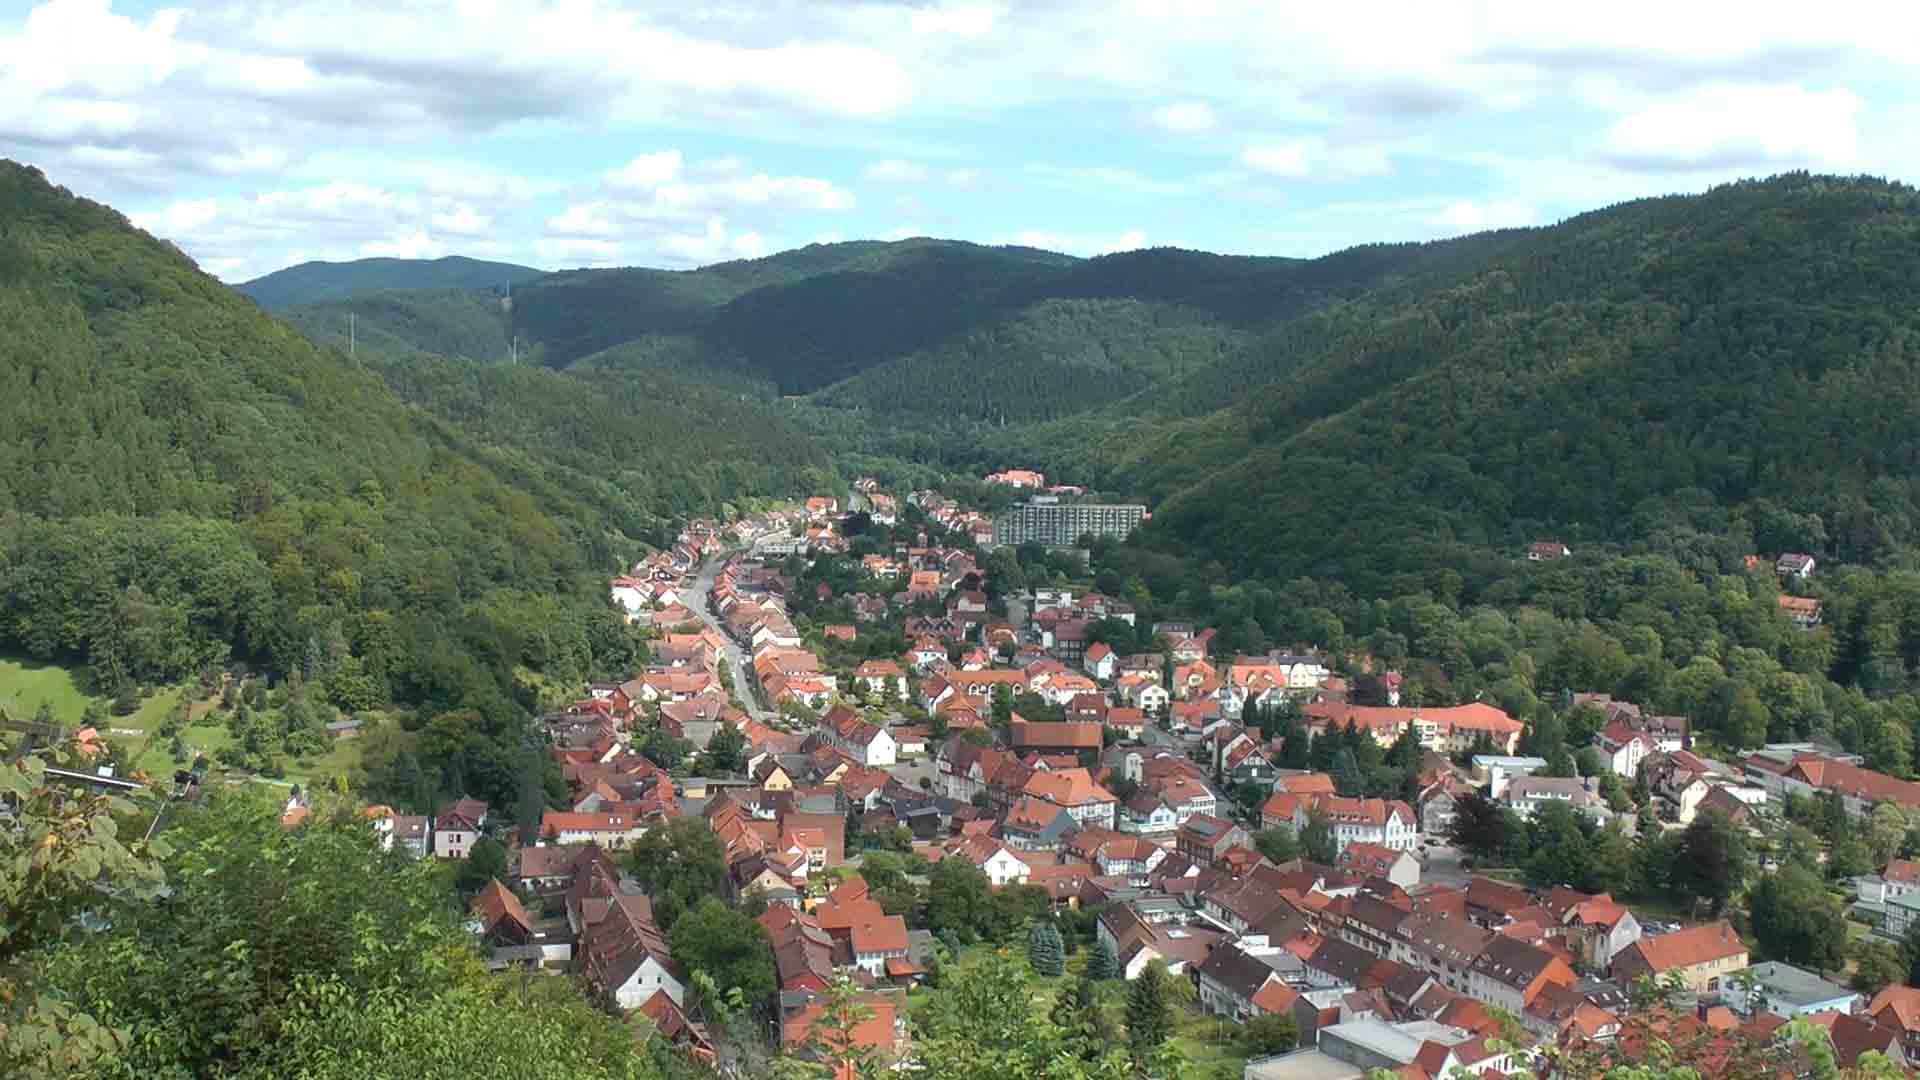 Sehenswertes in Bad Lauterberg